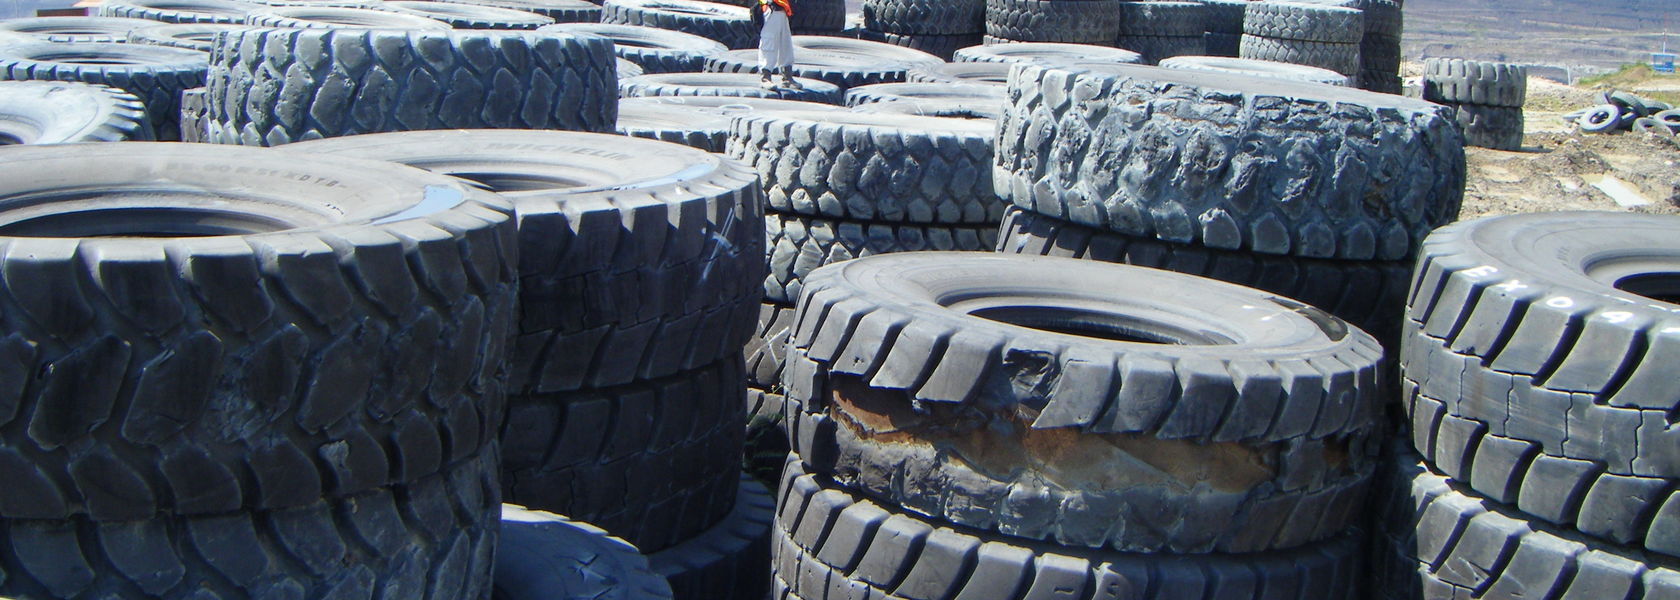 Tyre oil testing - MiningMonthly com